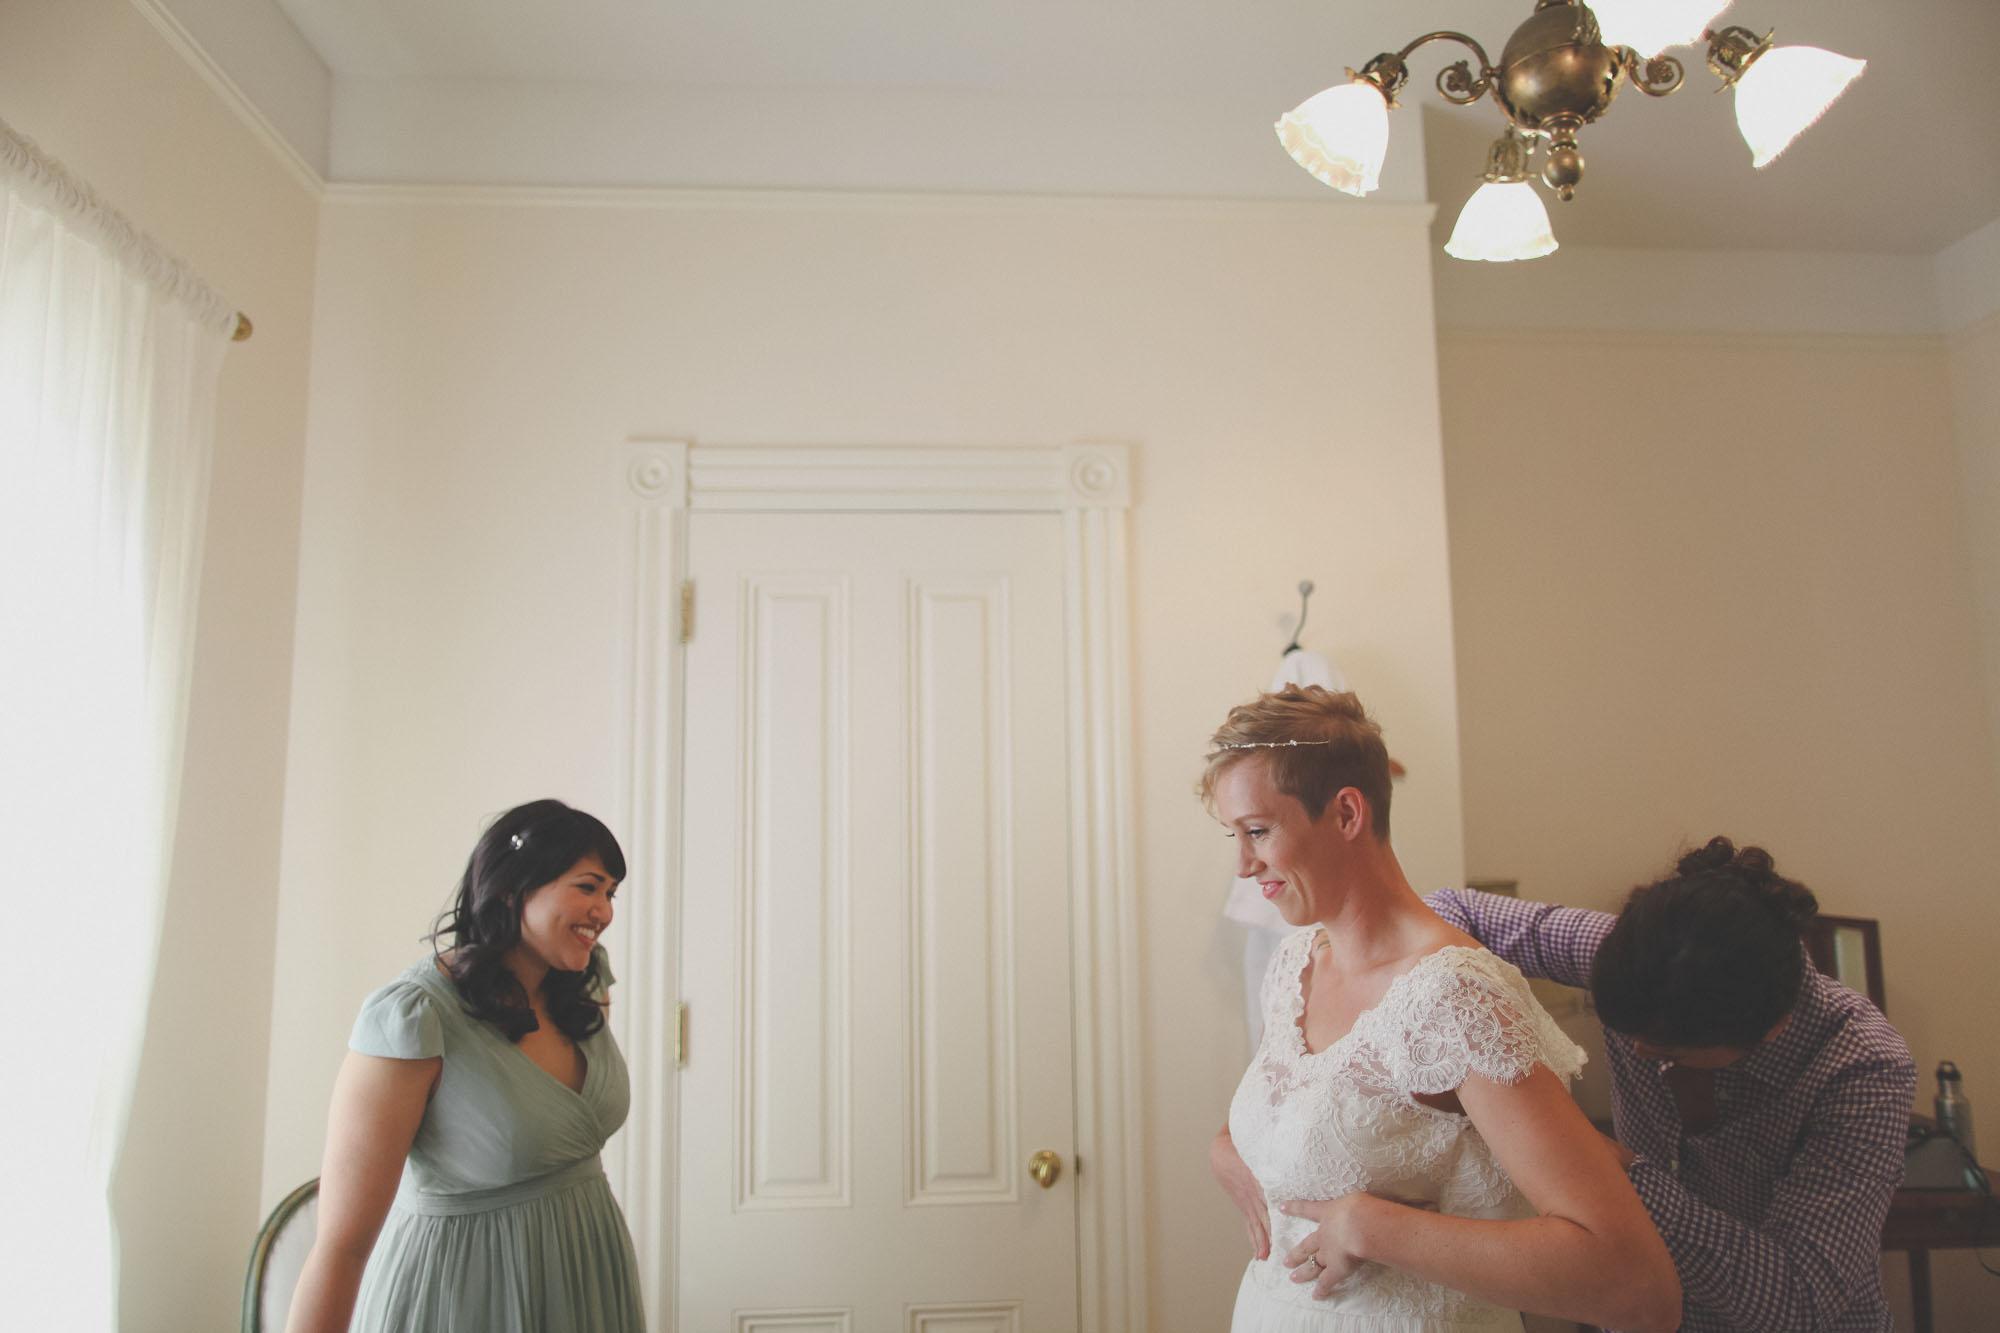 Gretchen_Gause_Petaluma_Olympias_Valley_Wedding_Photo-076.jpg